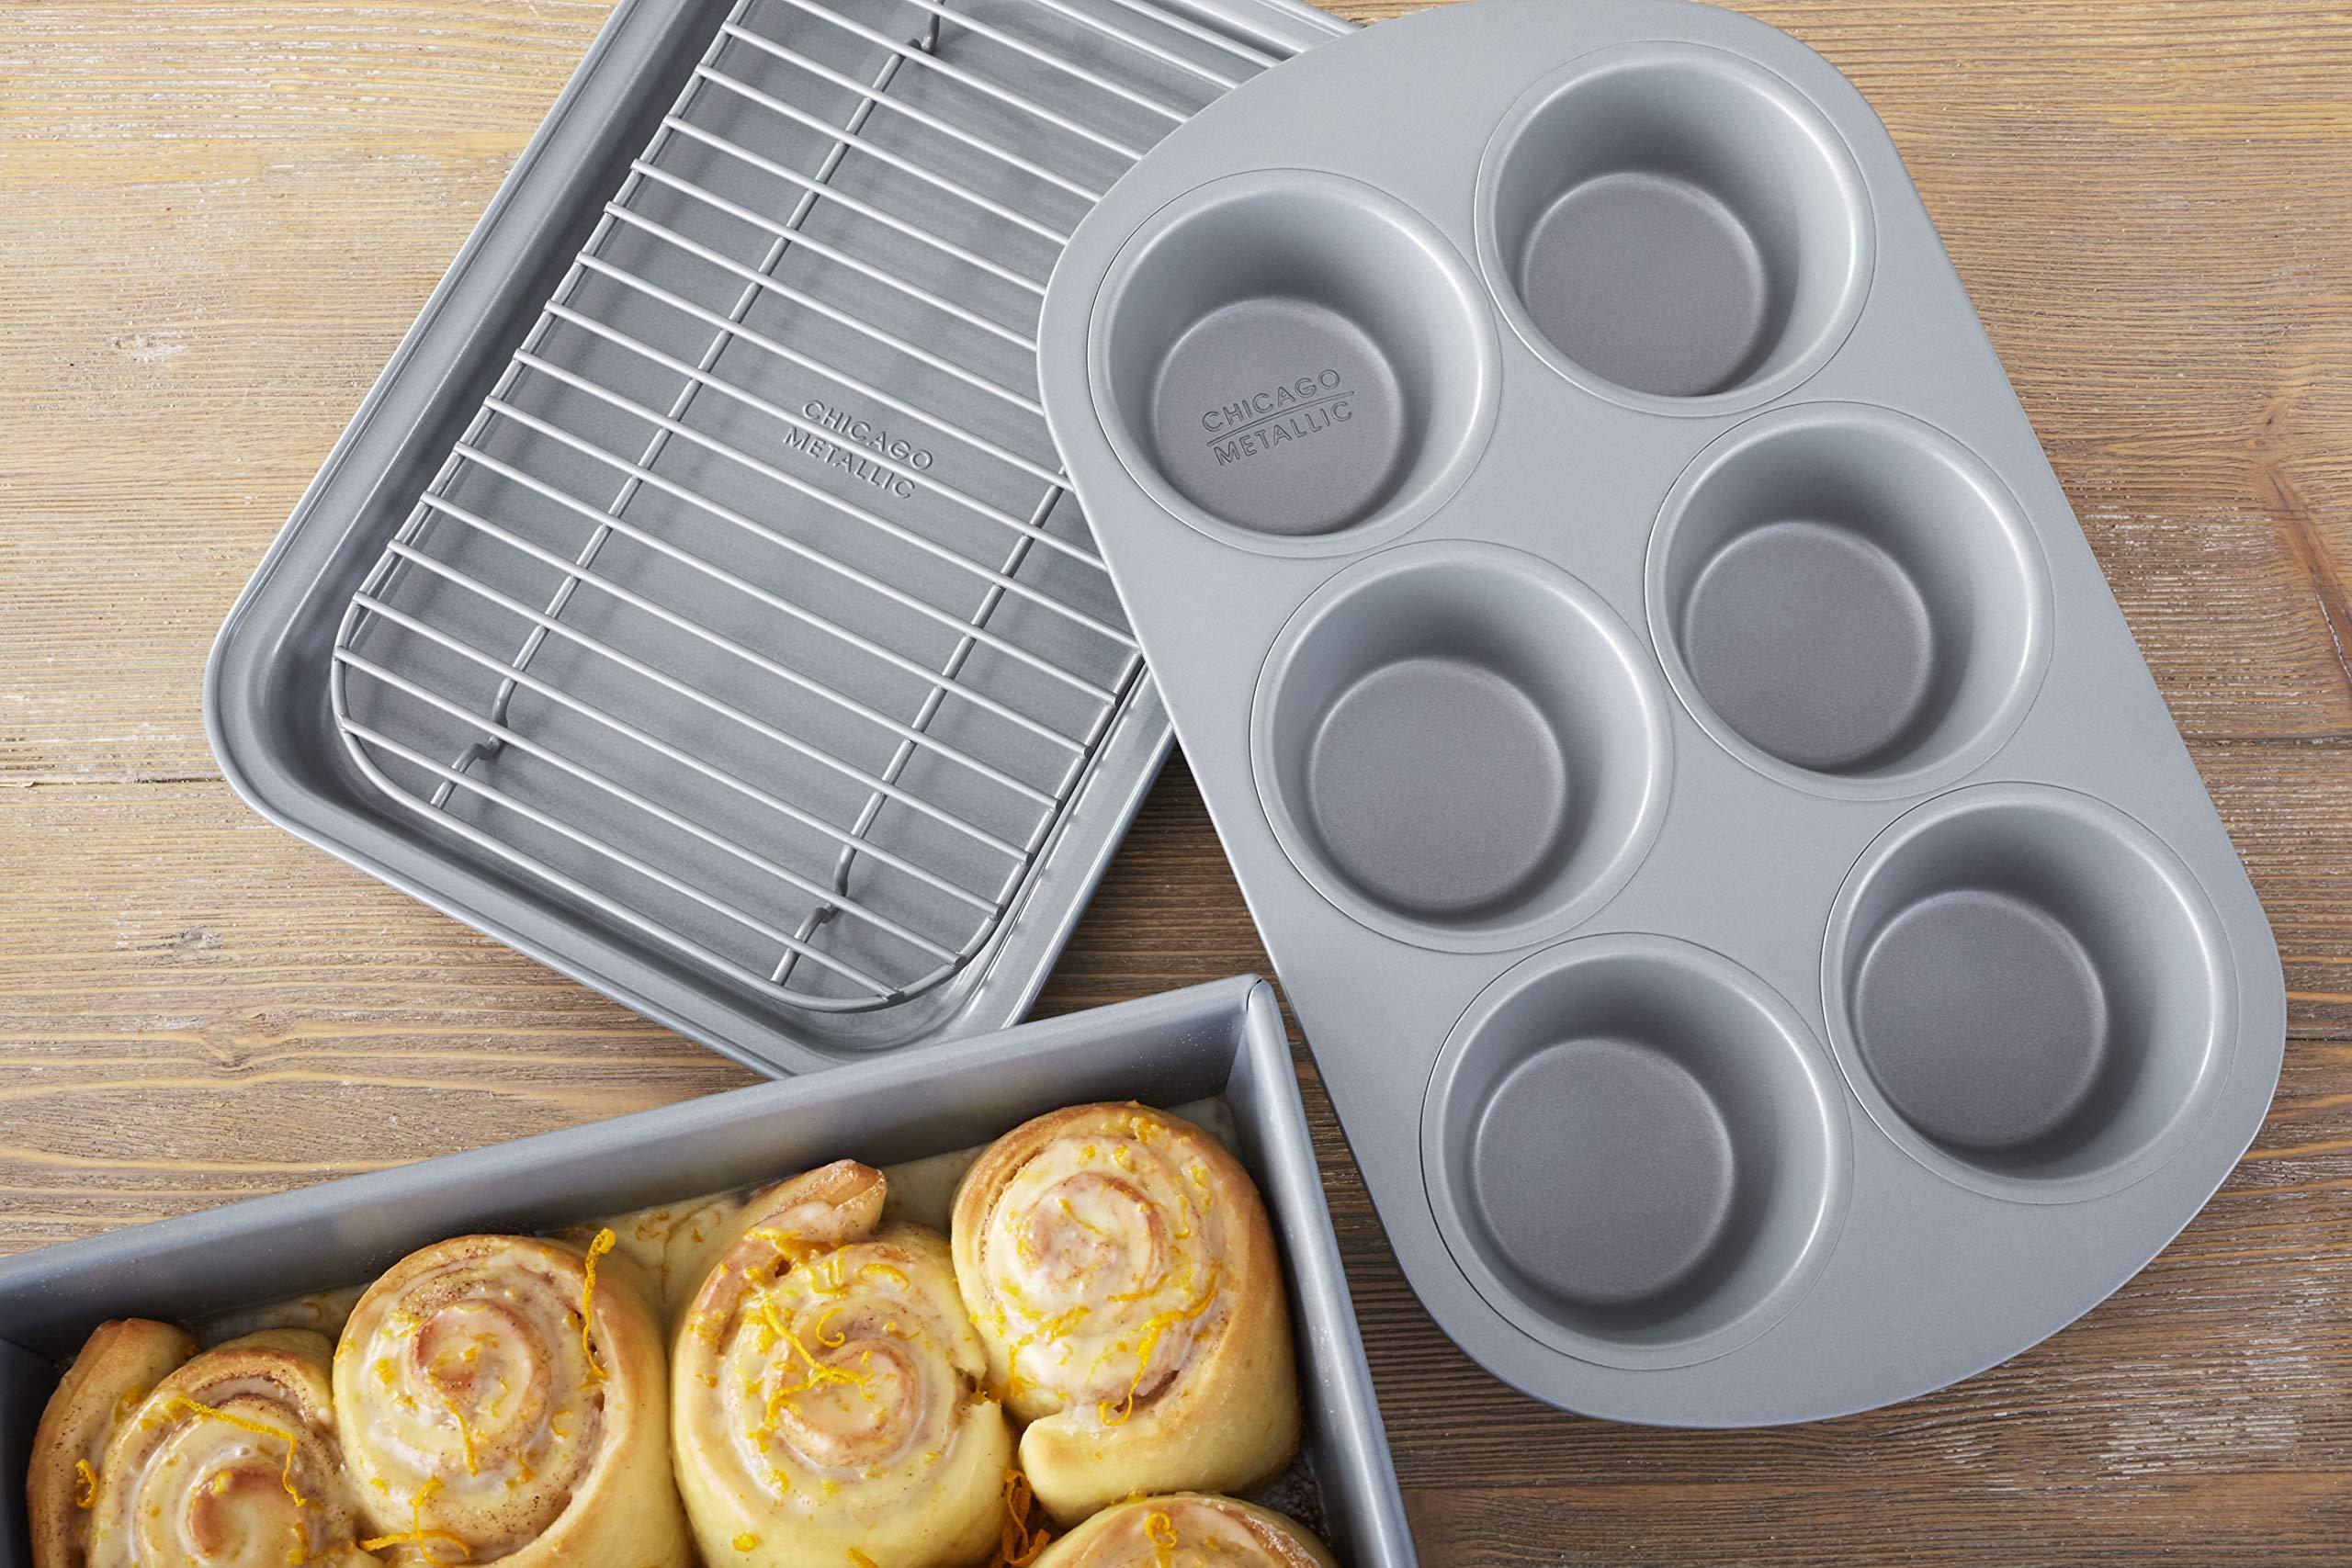 Chicago Metallic 8044 Non-Stick 4-Piece Toaster Oven Bakeware Set Set of 1 by Chicago Metallic (Image #3)